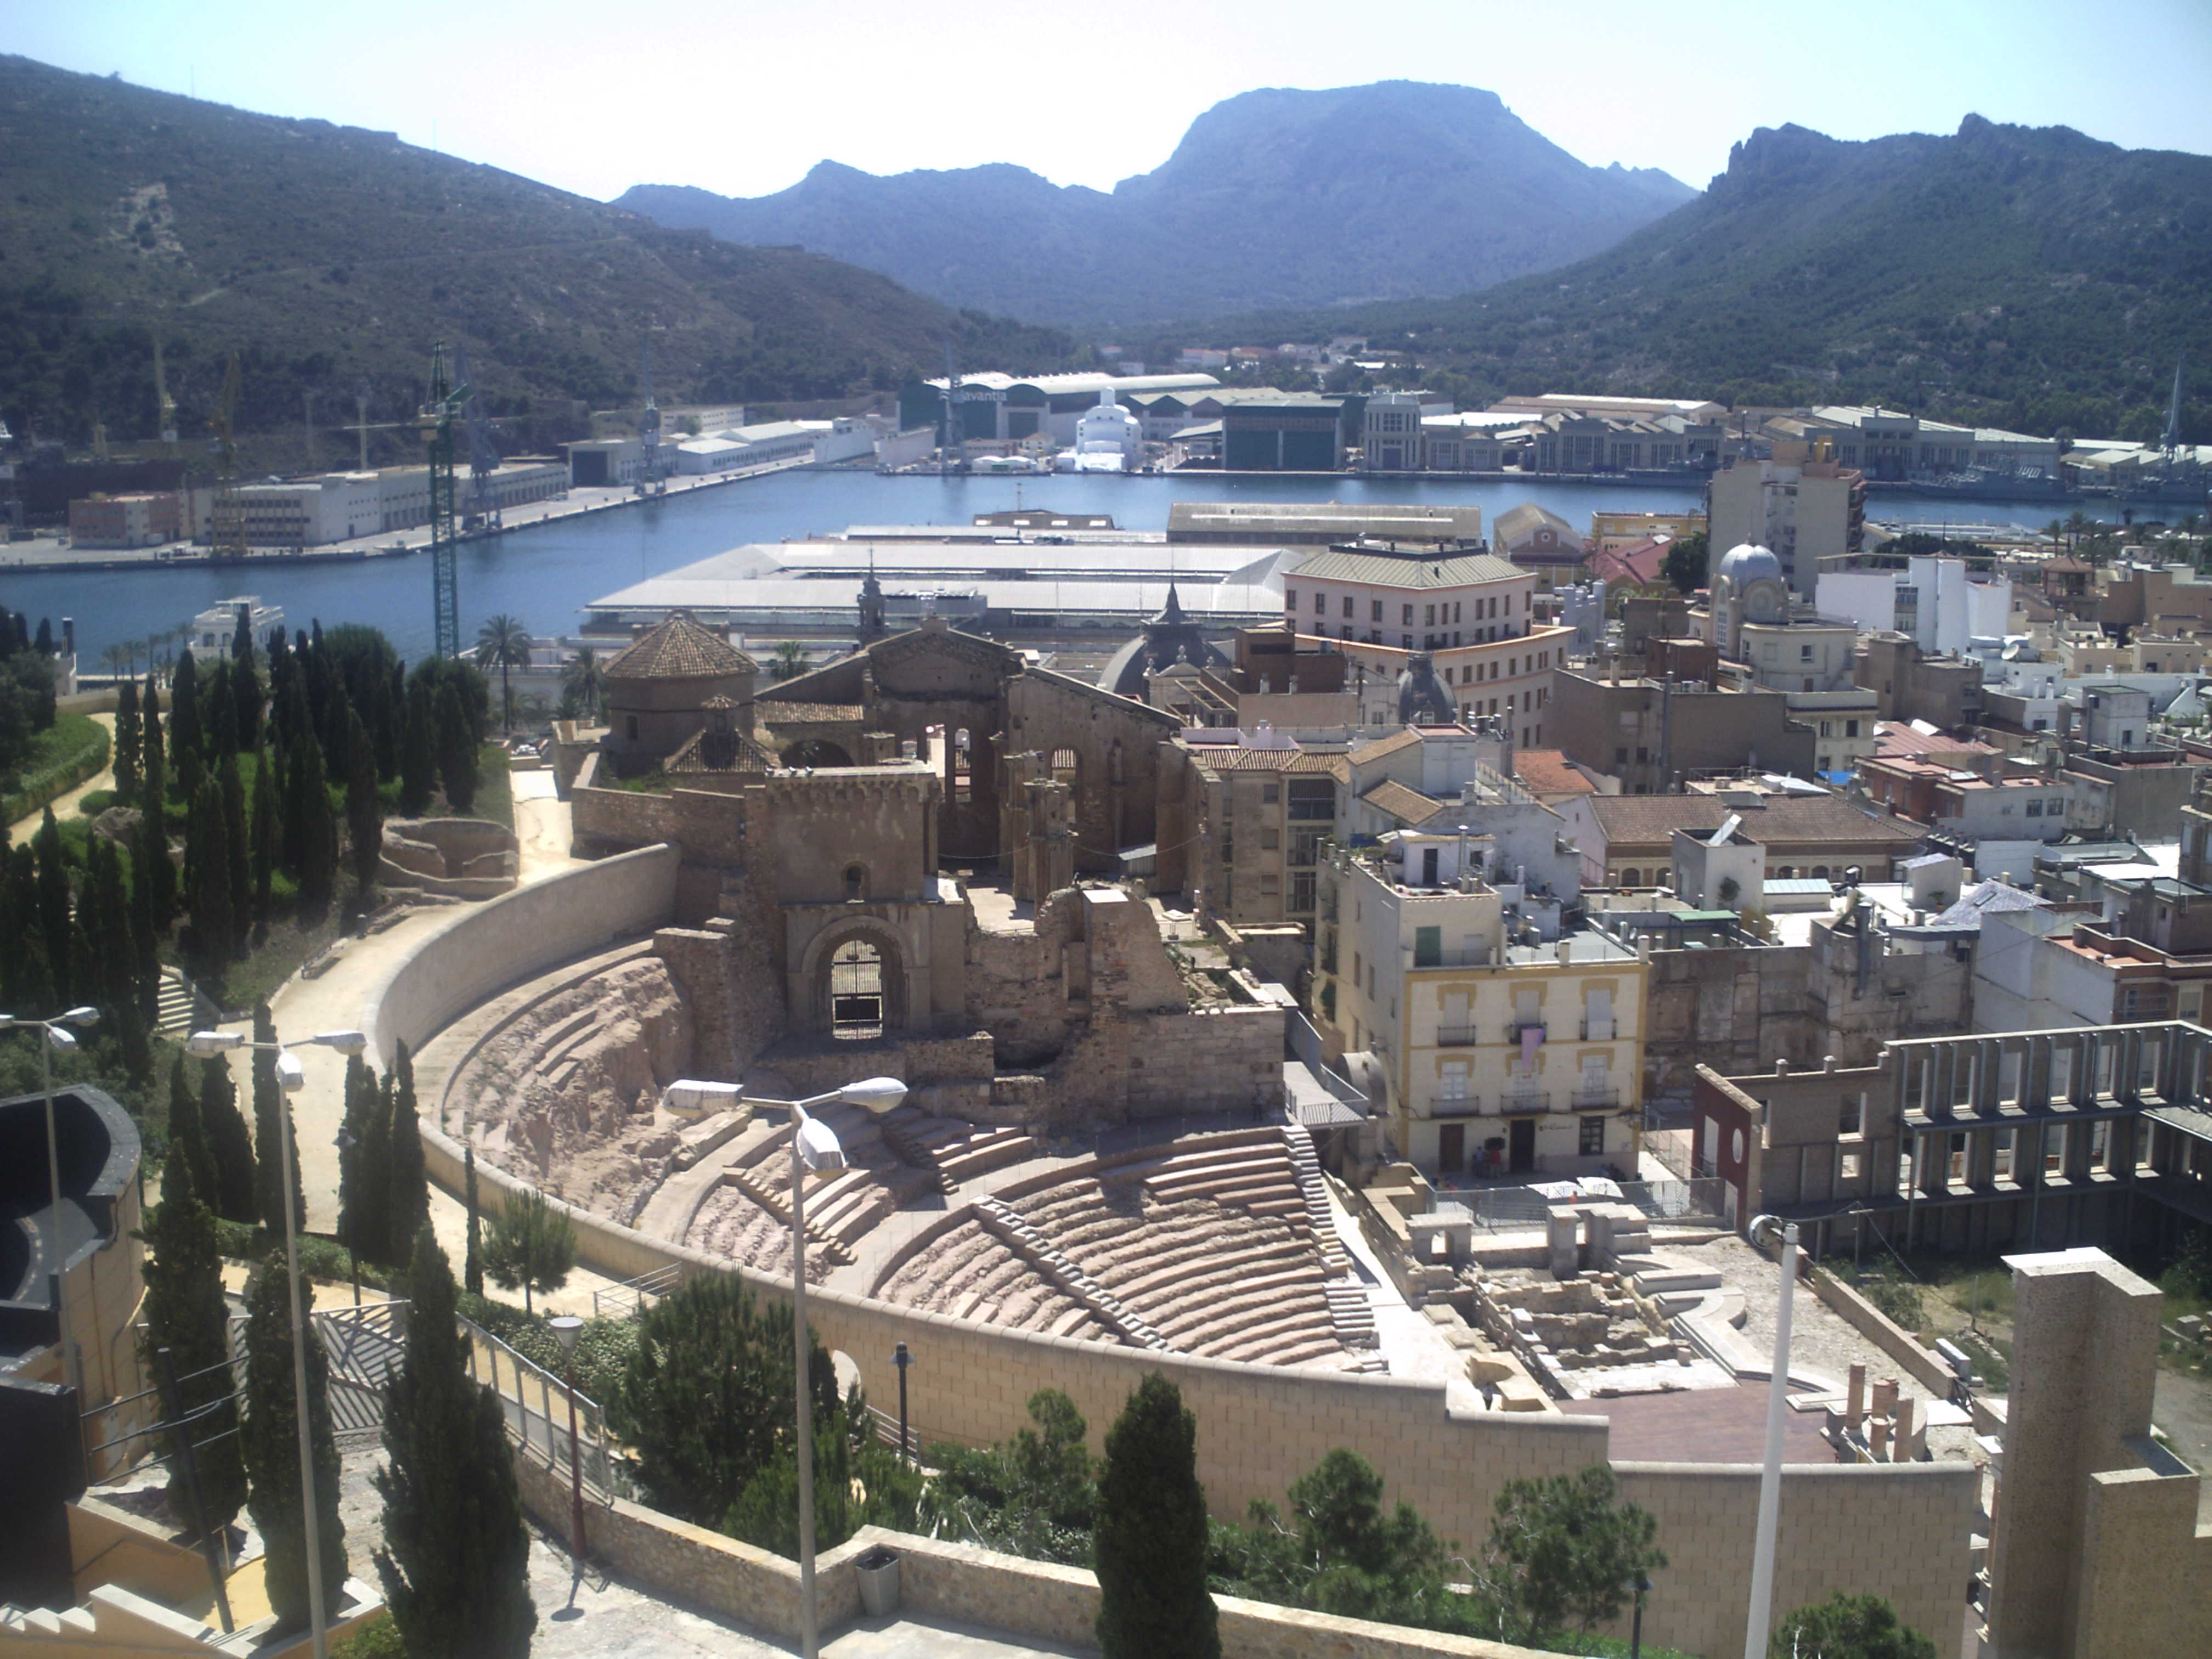 Cartagena Spain  City new picture : Archivo:Teatro romano cartagena 1 Wikipedia, la enciclopedia ...